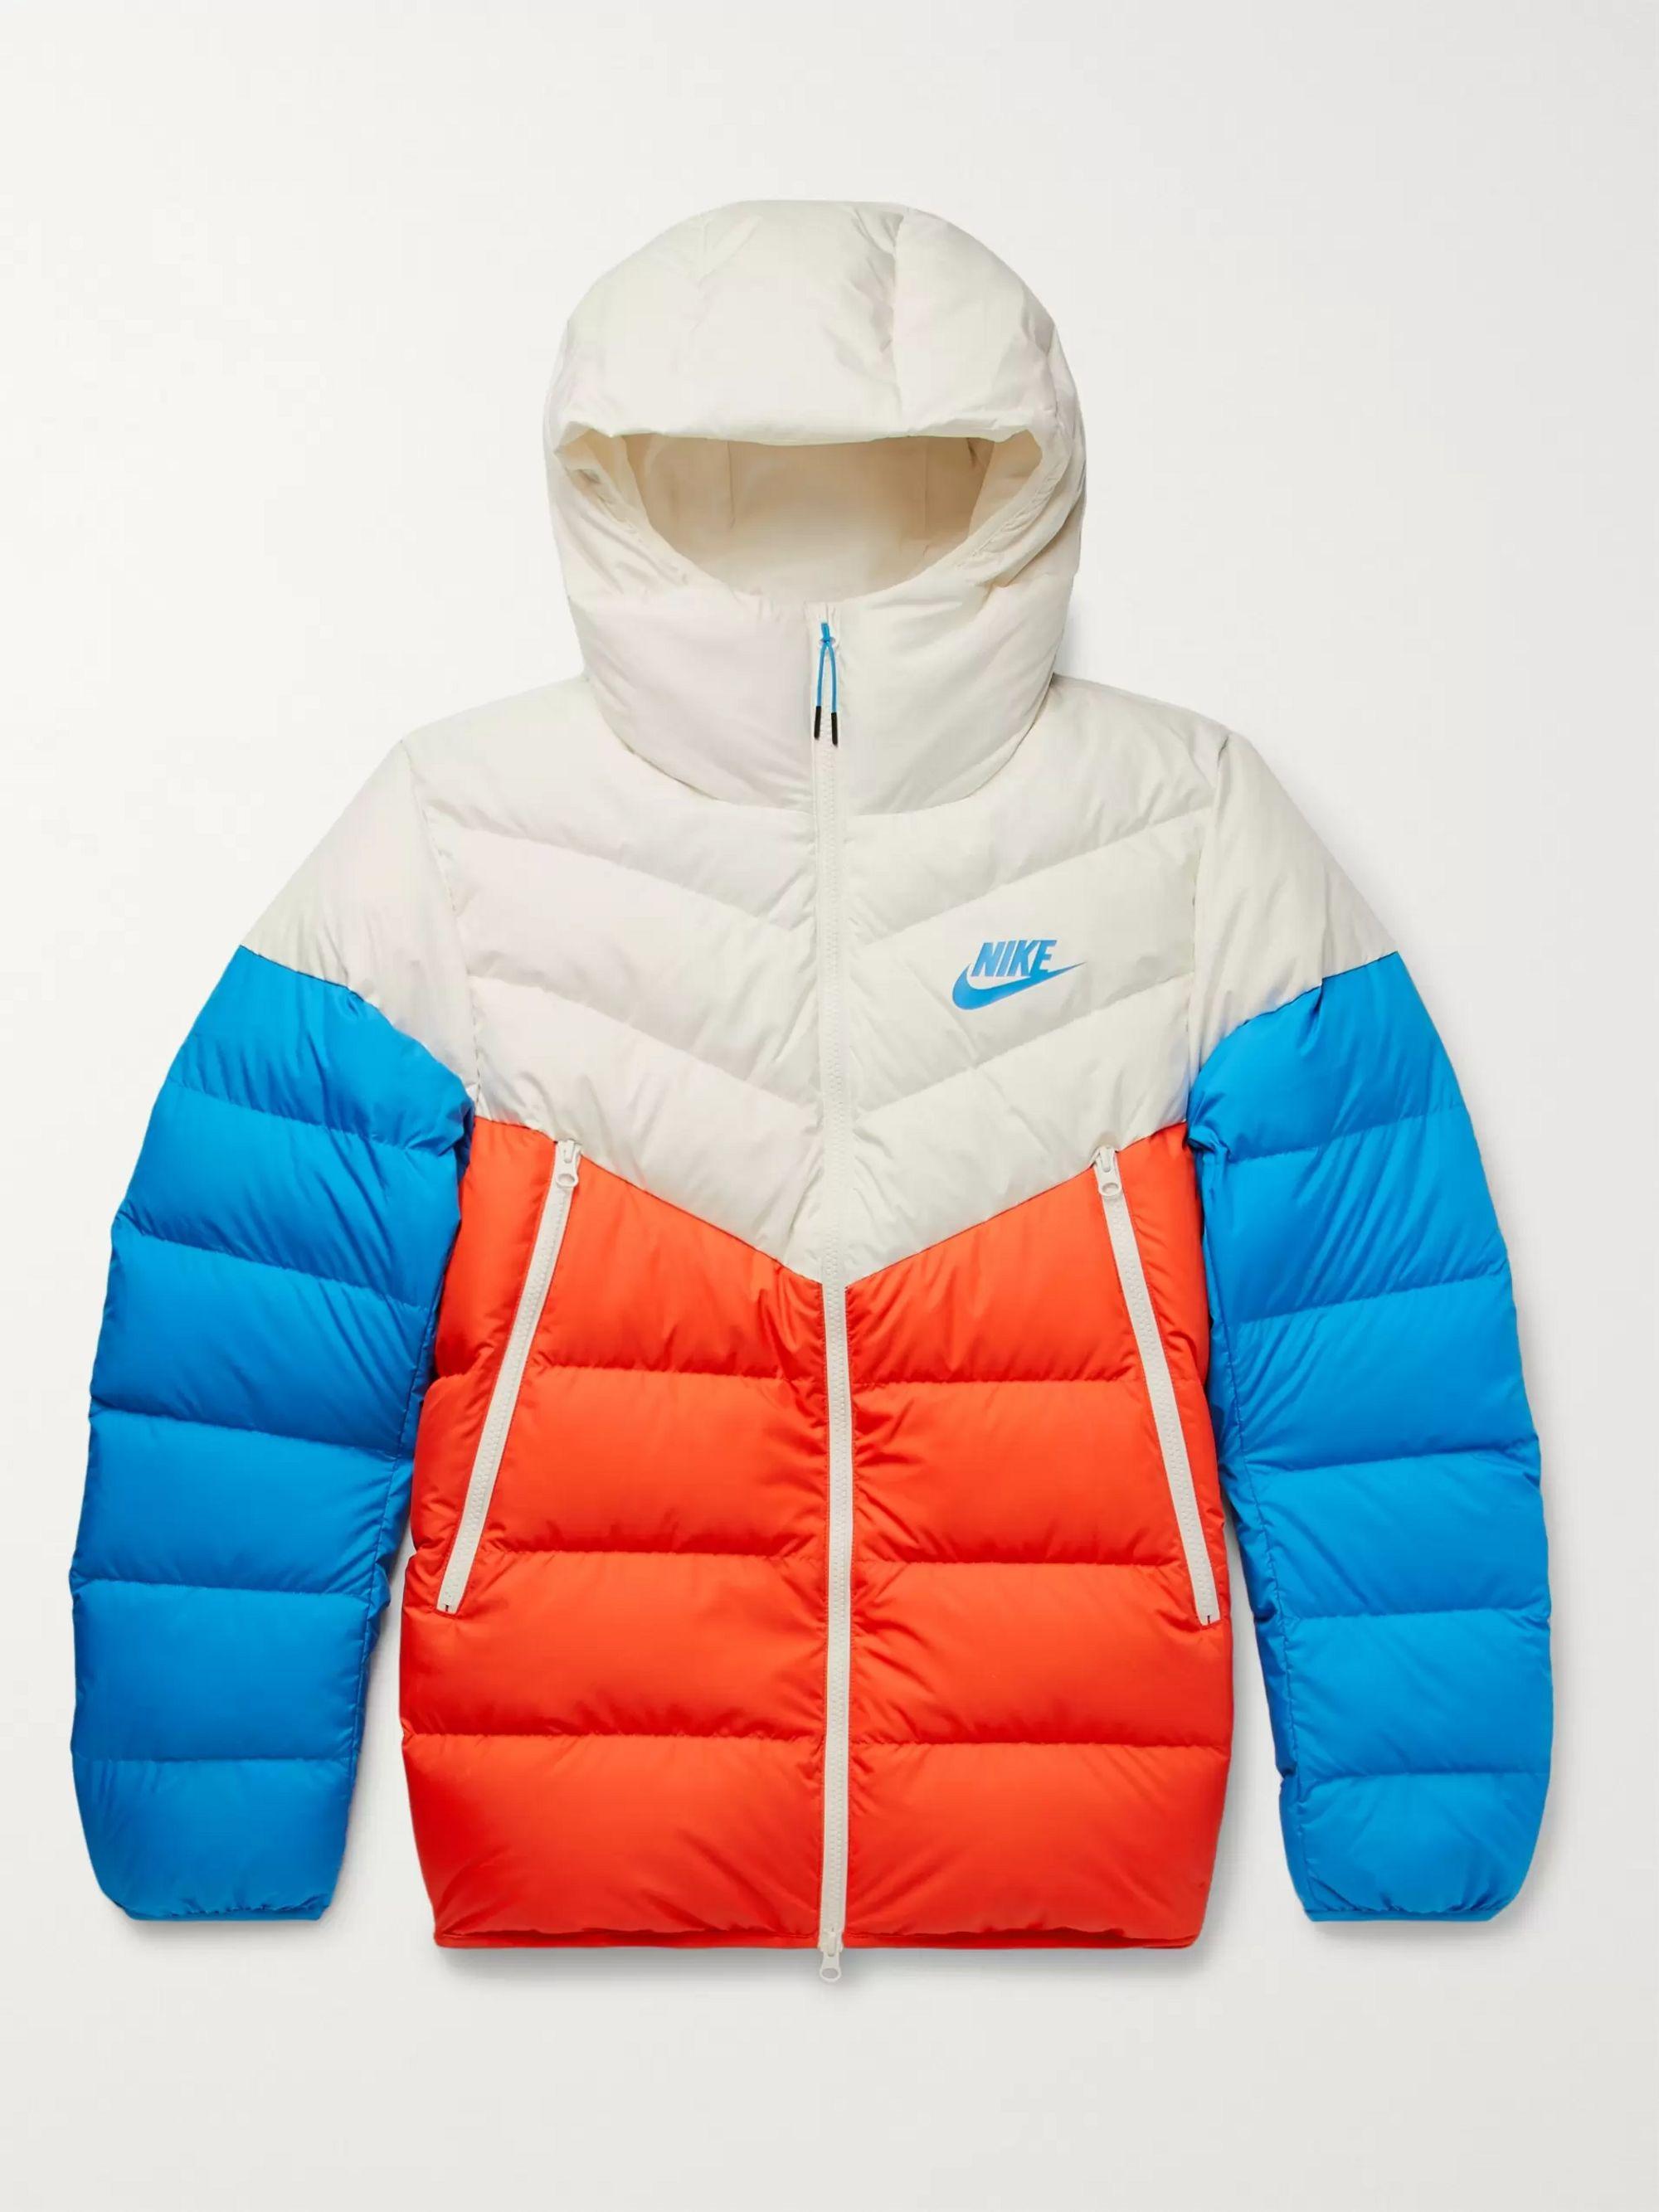 Nike Windrunner winter jacket grey red